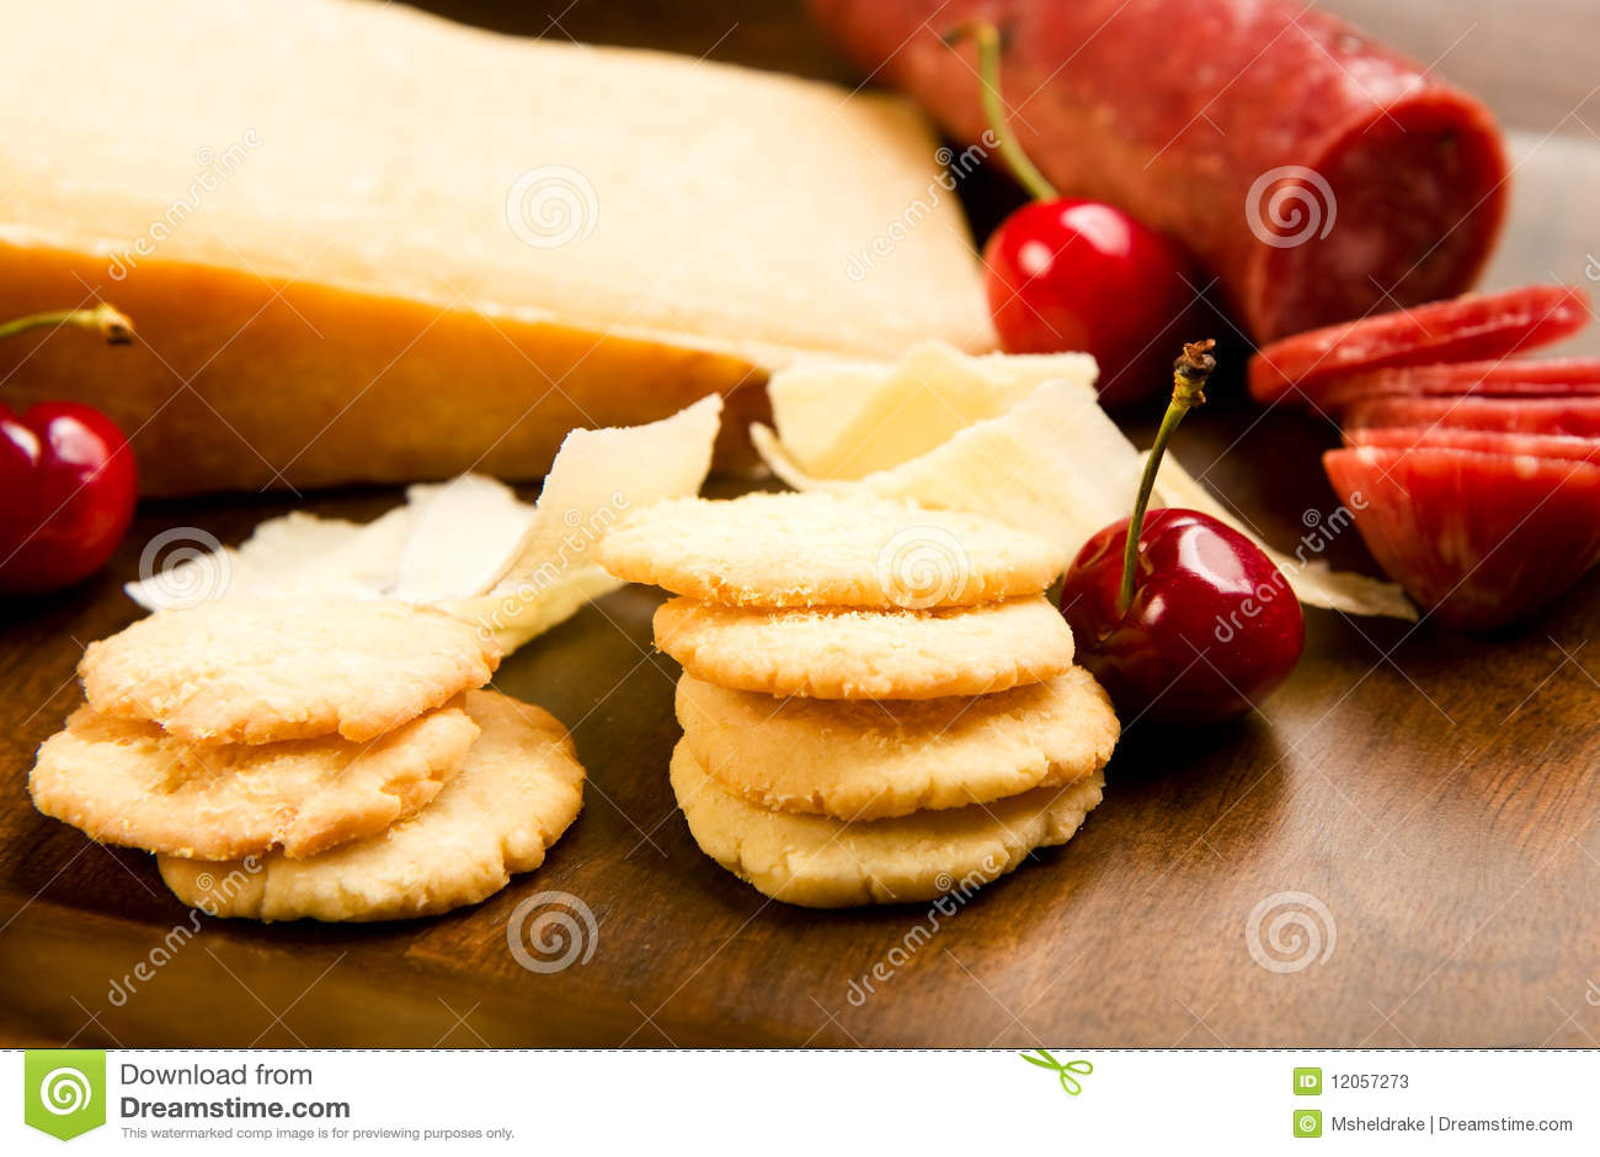 Parmesan shortbread biscuits and salami